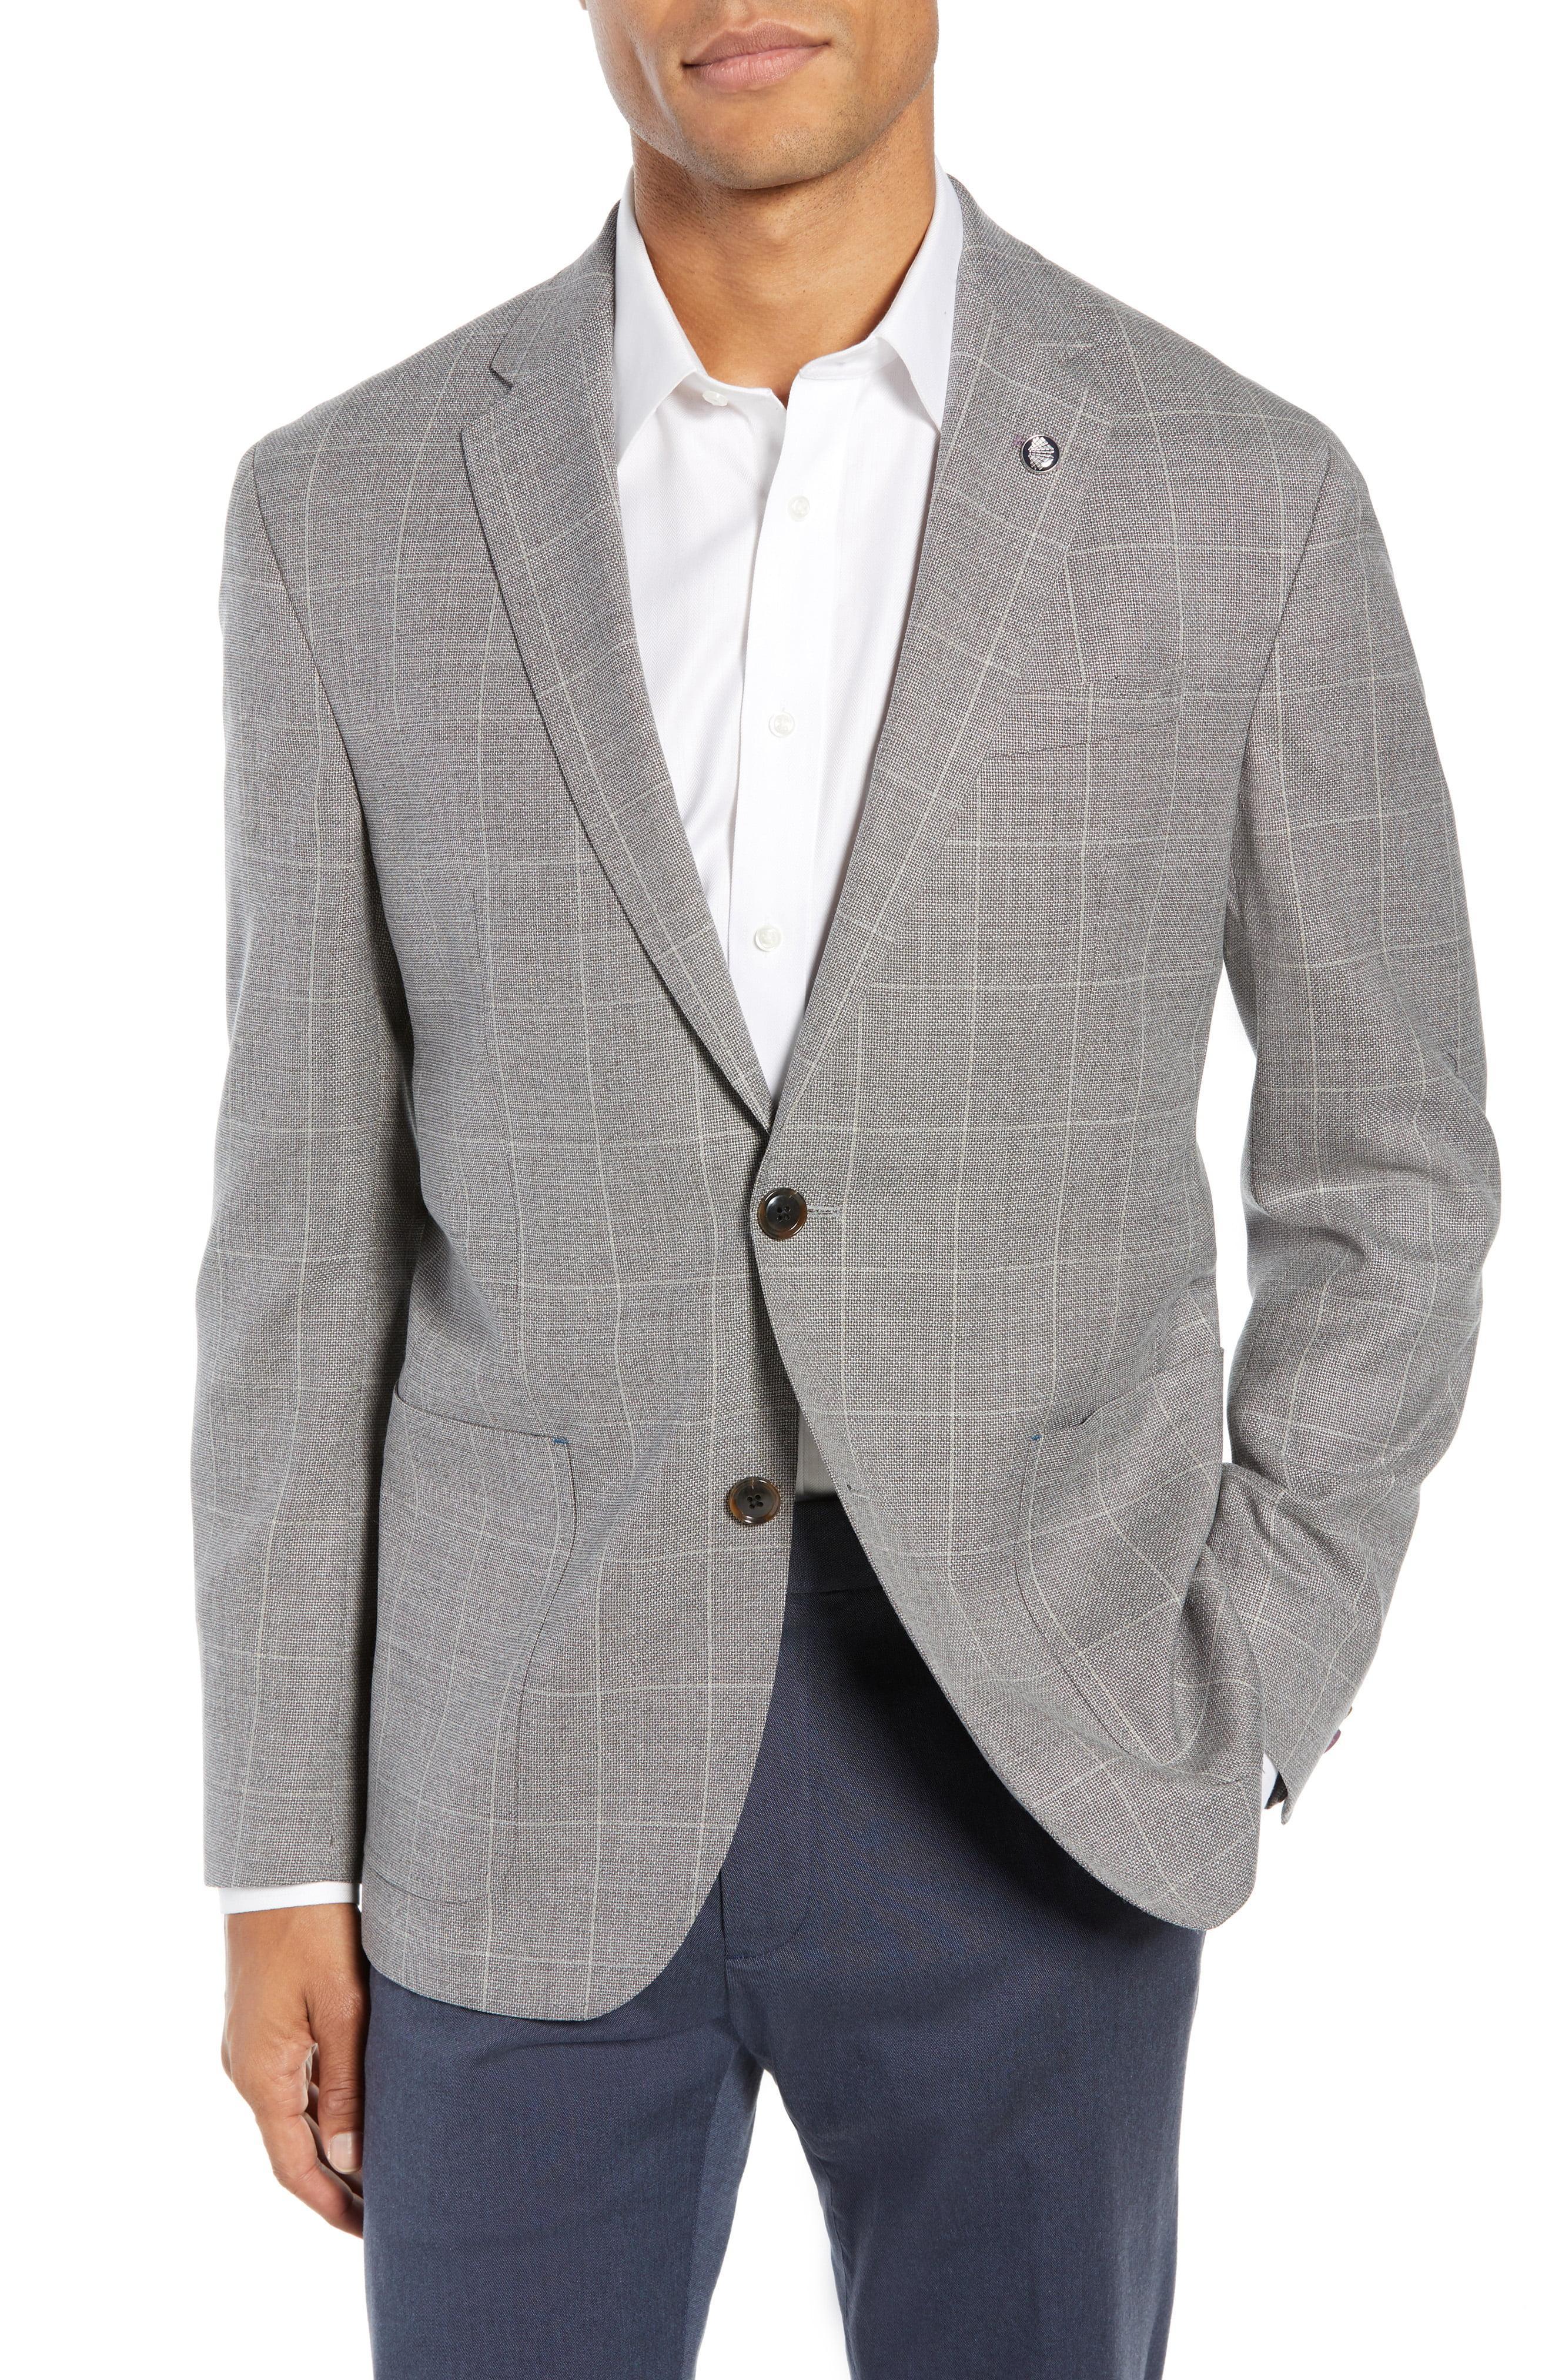 a69c7beb5e15b3 Lyst - Ted Baker Kyle Trim Fit Windowpane Wool Sport Coat in Gray ...